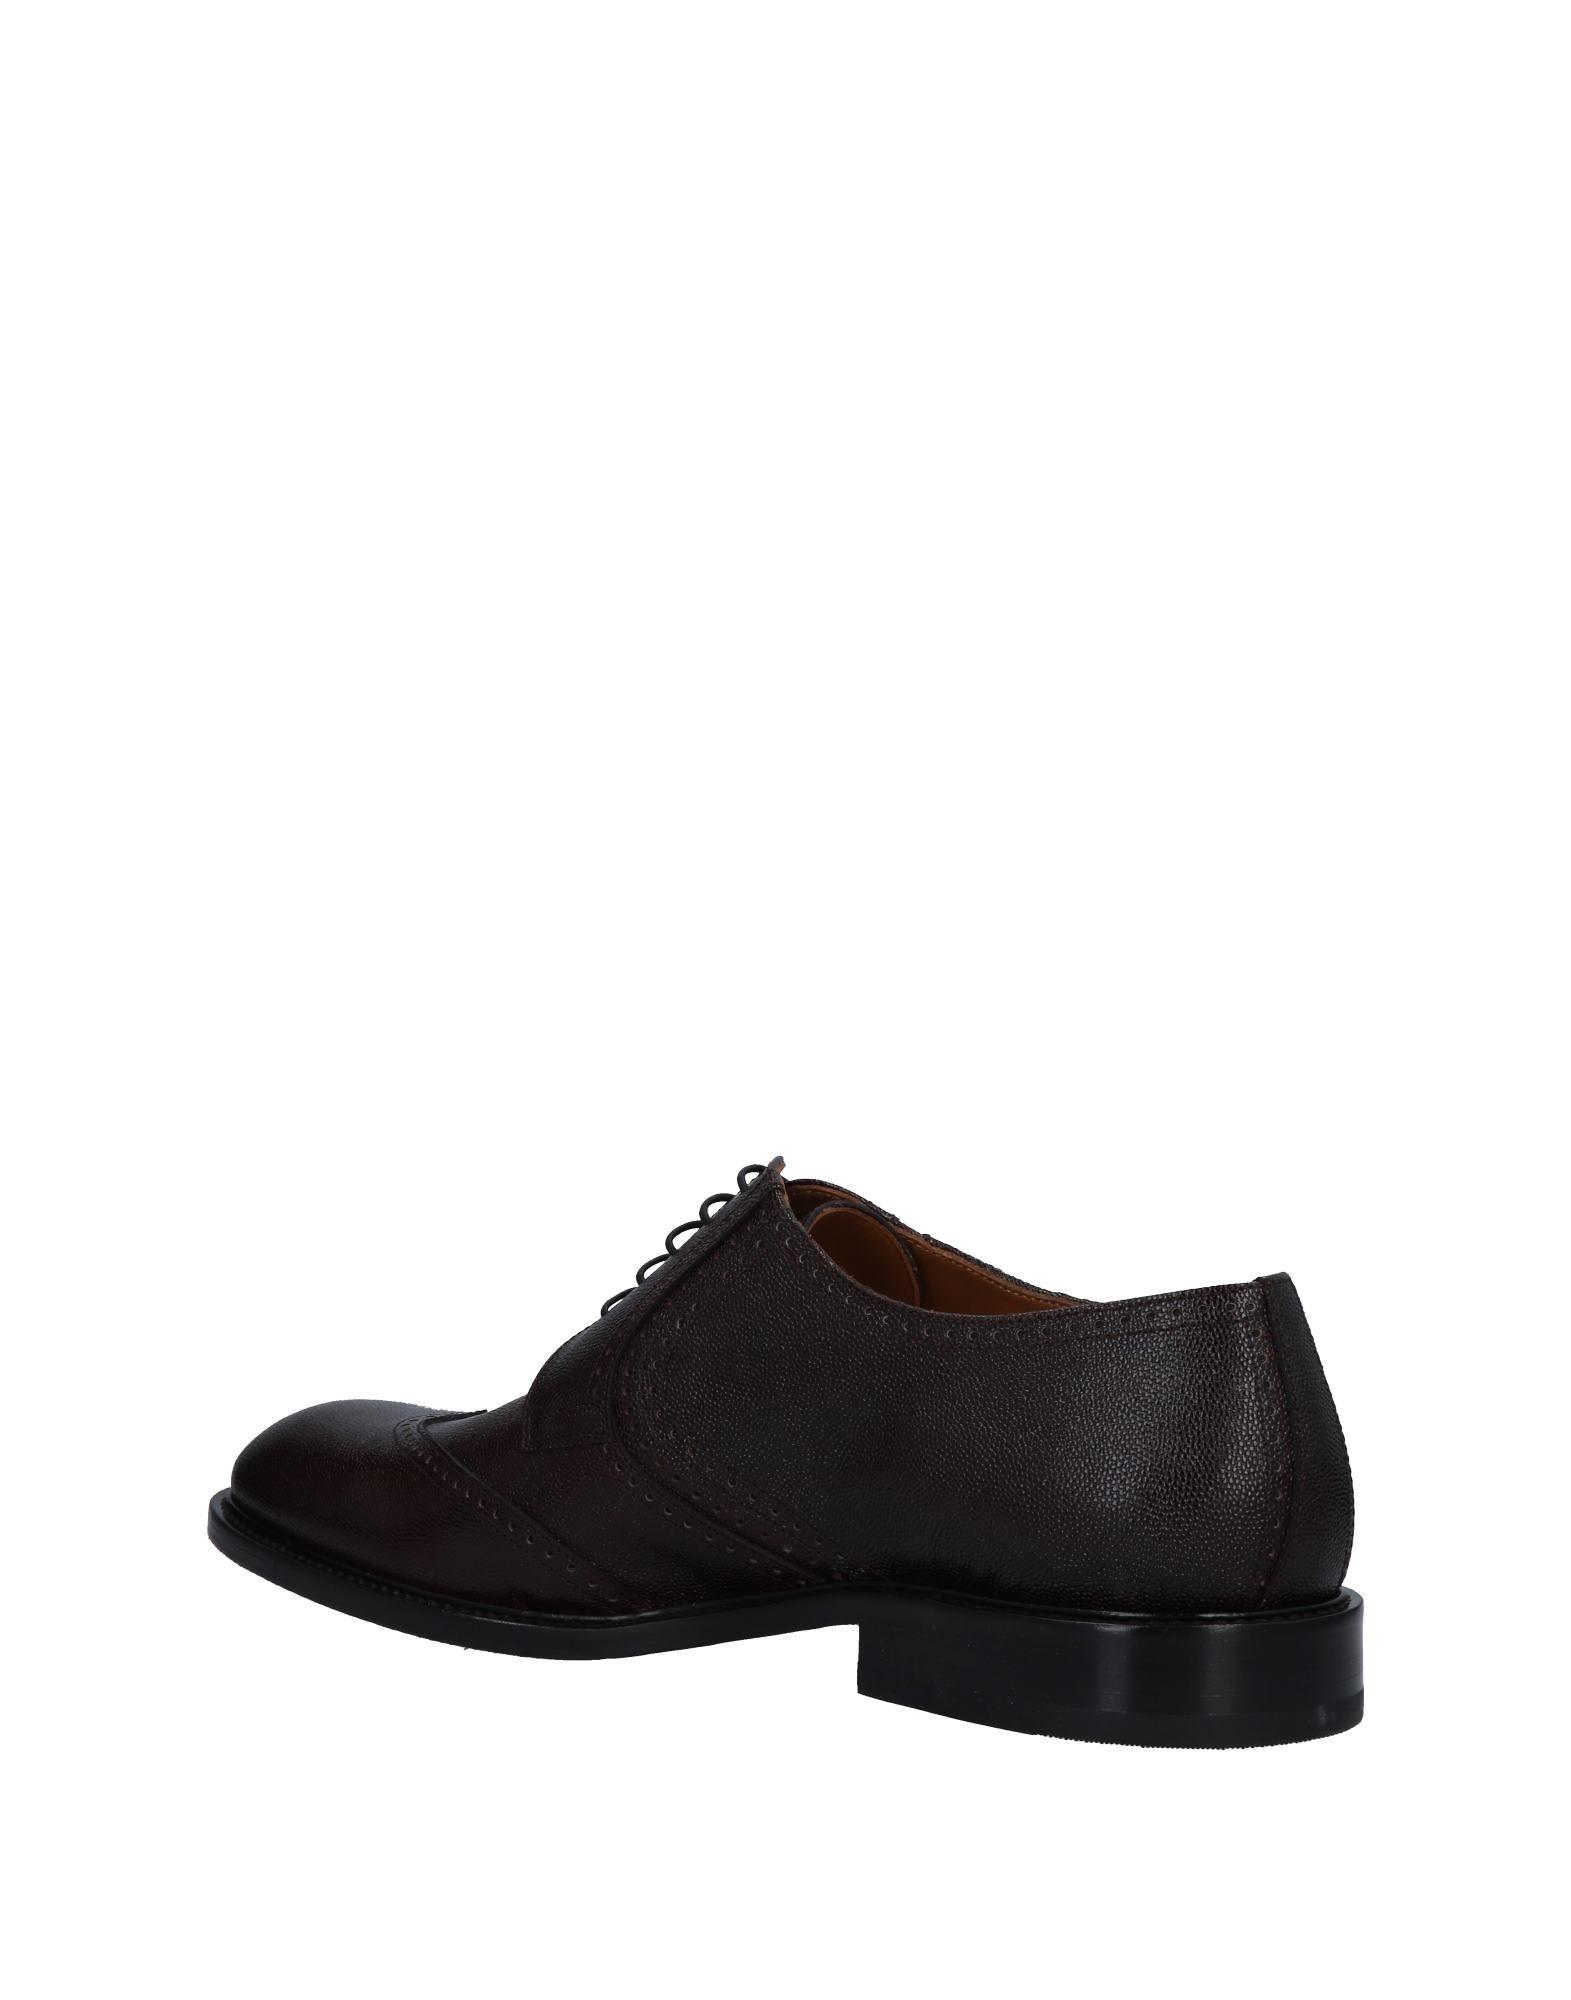 Giovanni Conti Schnürschuhe Herren  Gute 11471586JV Gute  Qualität beliebte Schuhe 93a22d